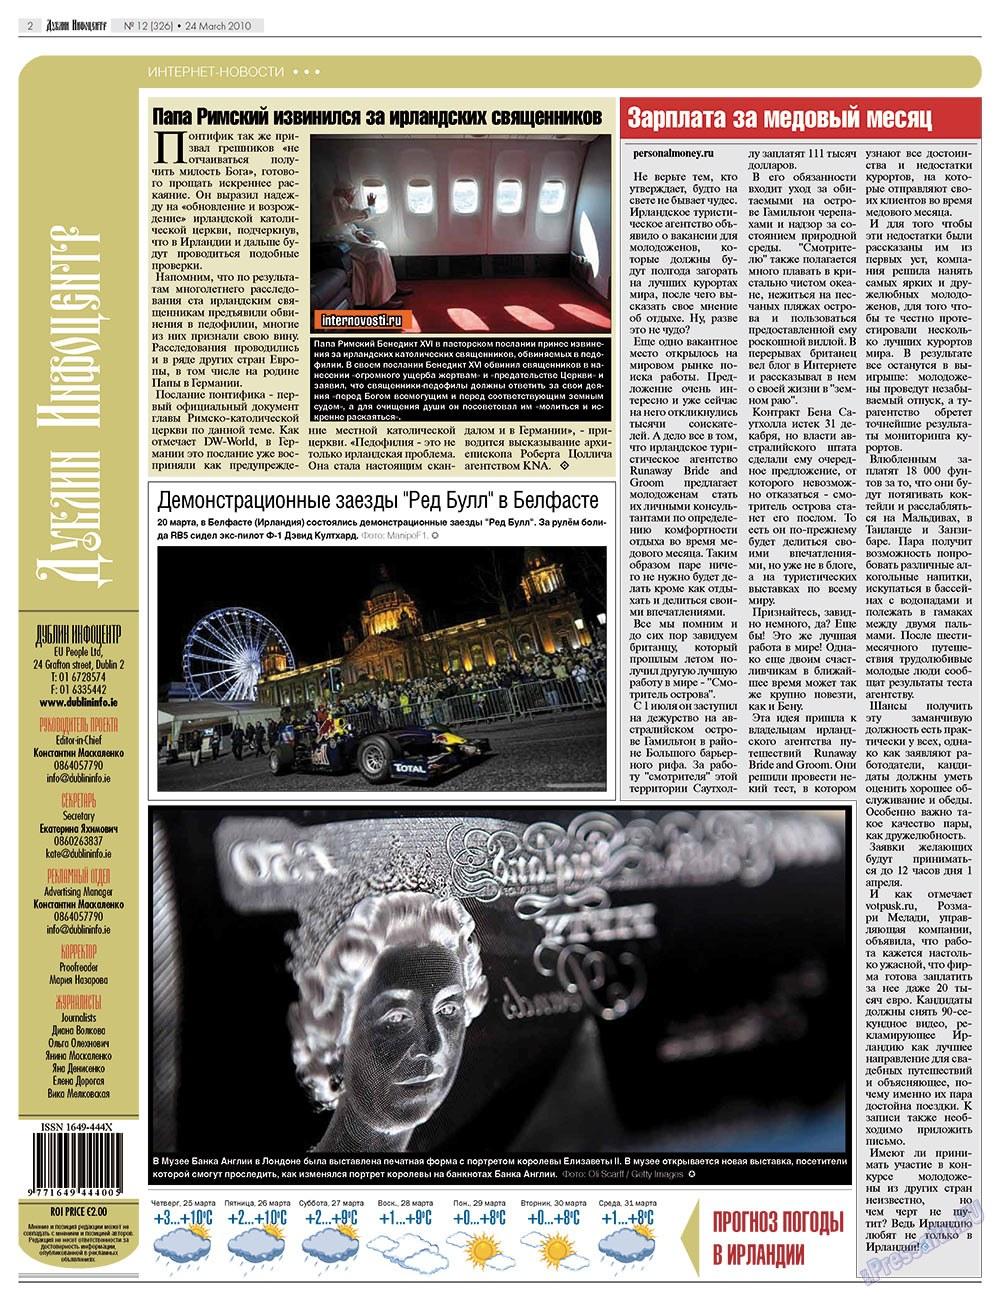 Дублин инфоцентр (газета). 2010 год, номер 12, стр. 2